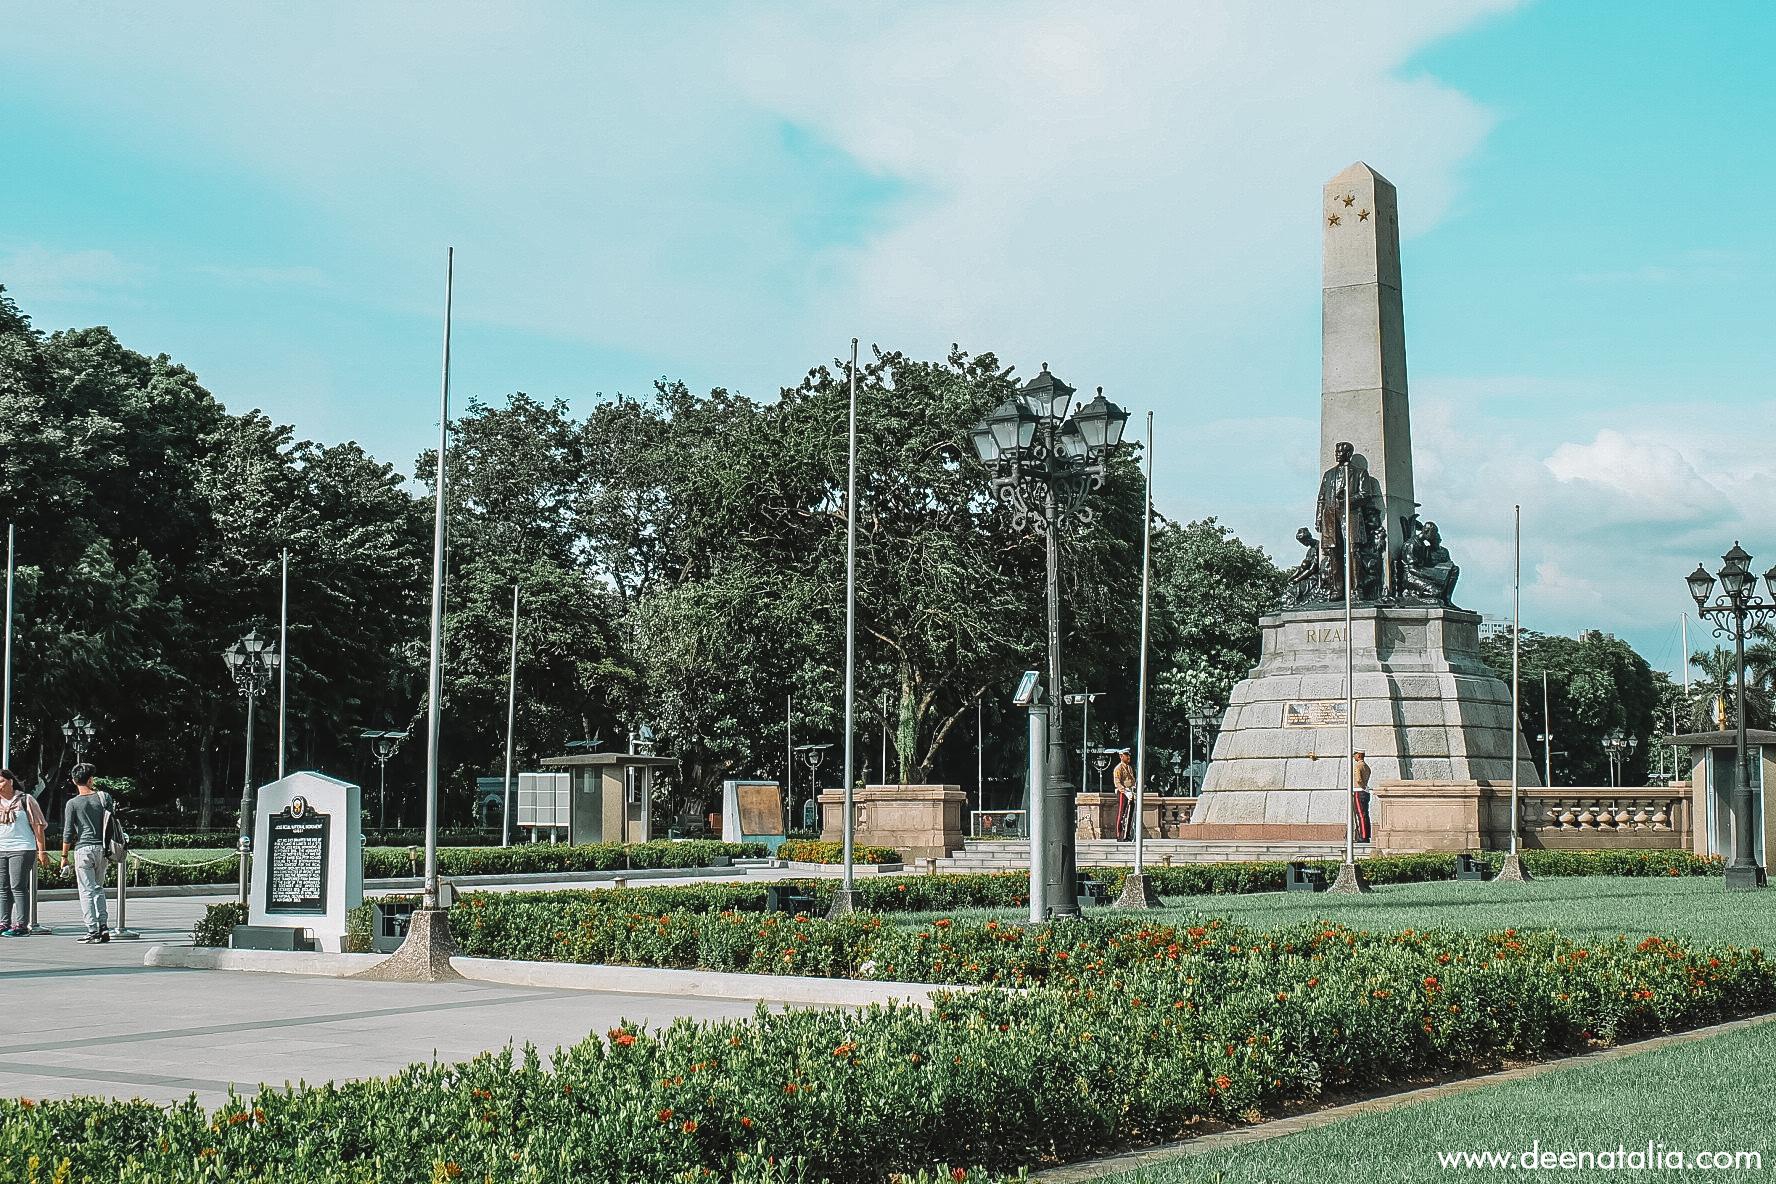 Monumen of Jose Rizal